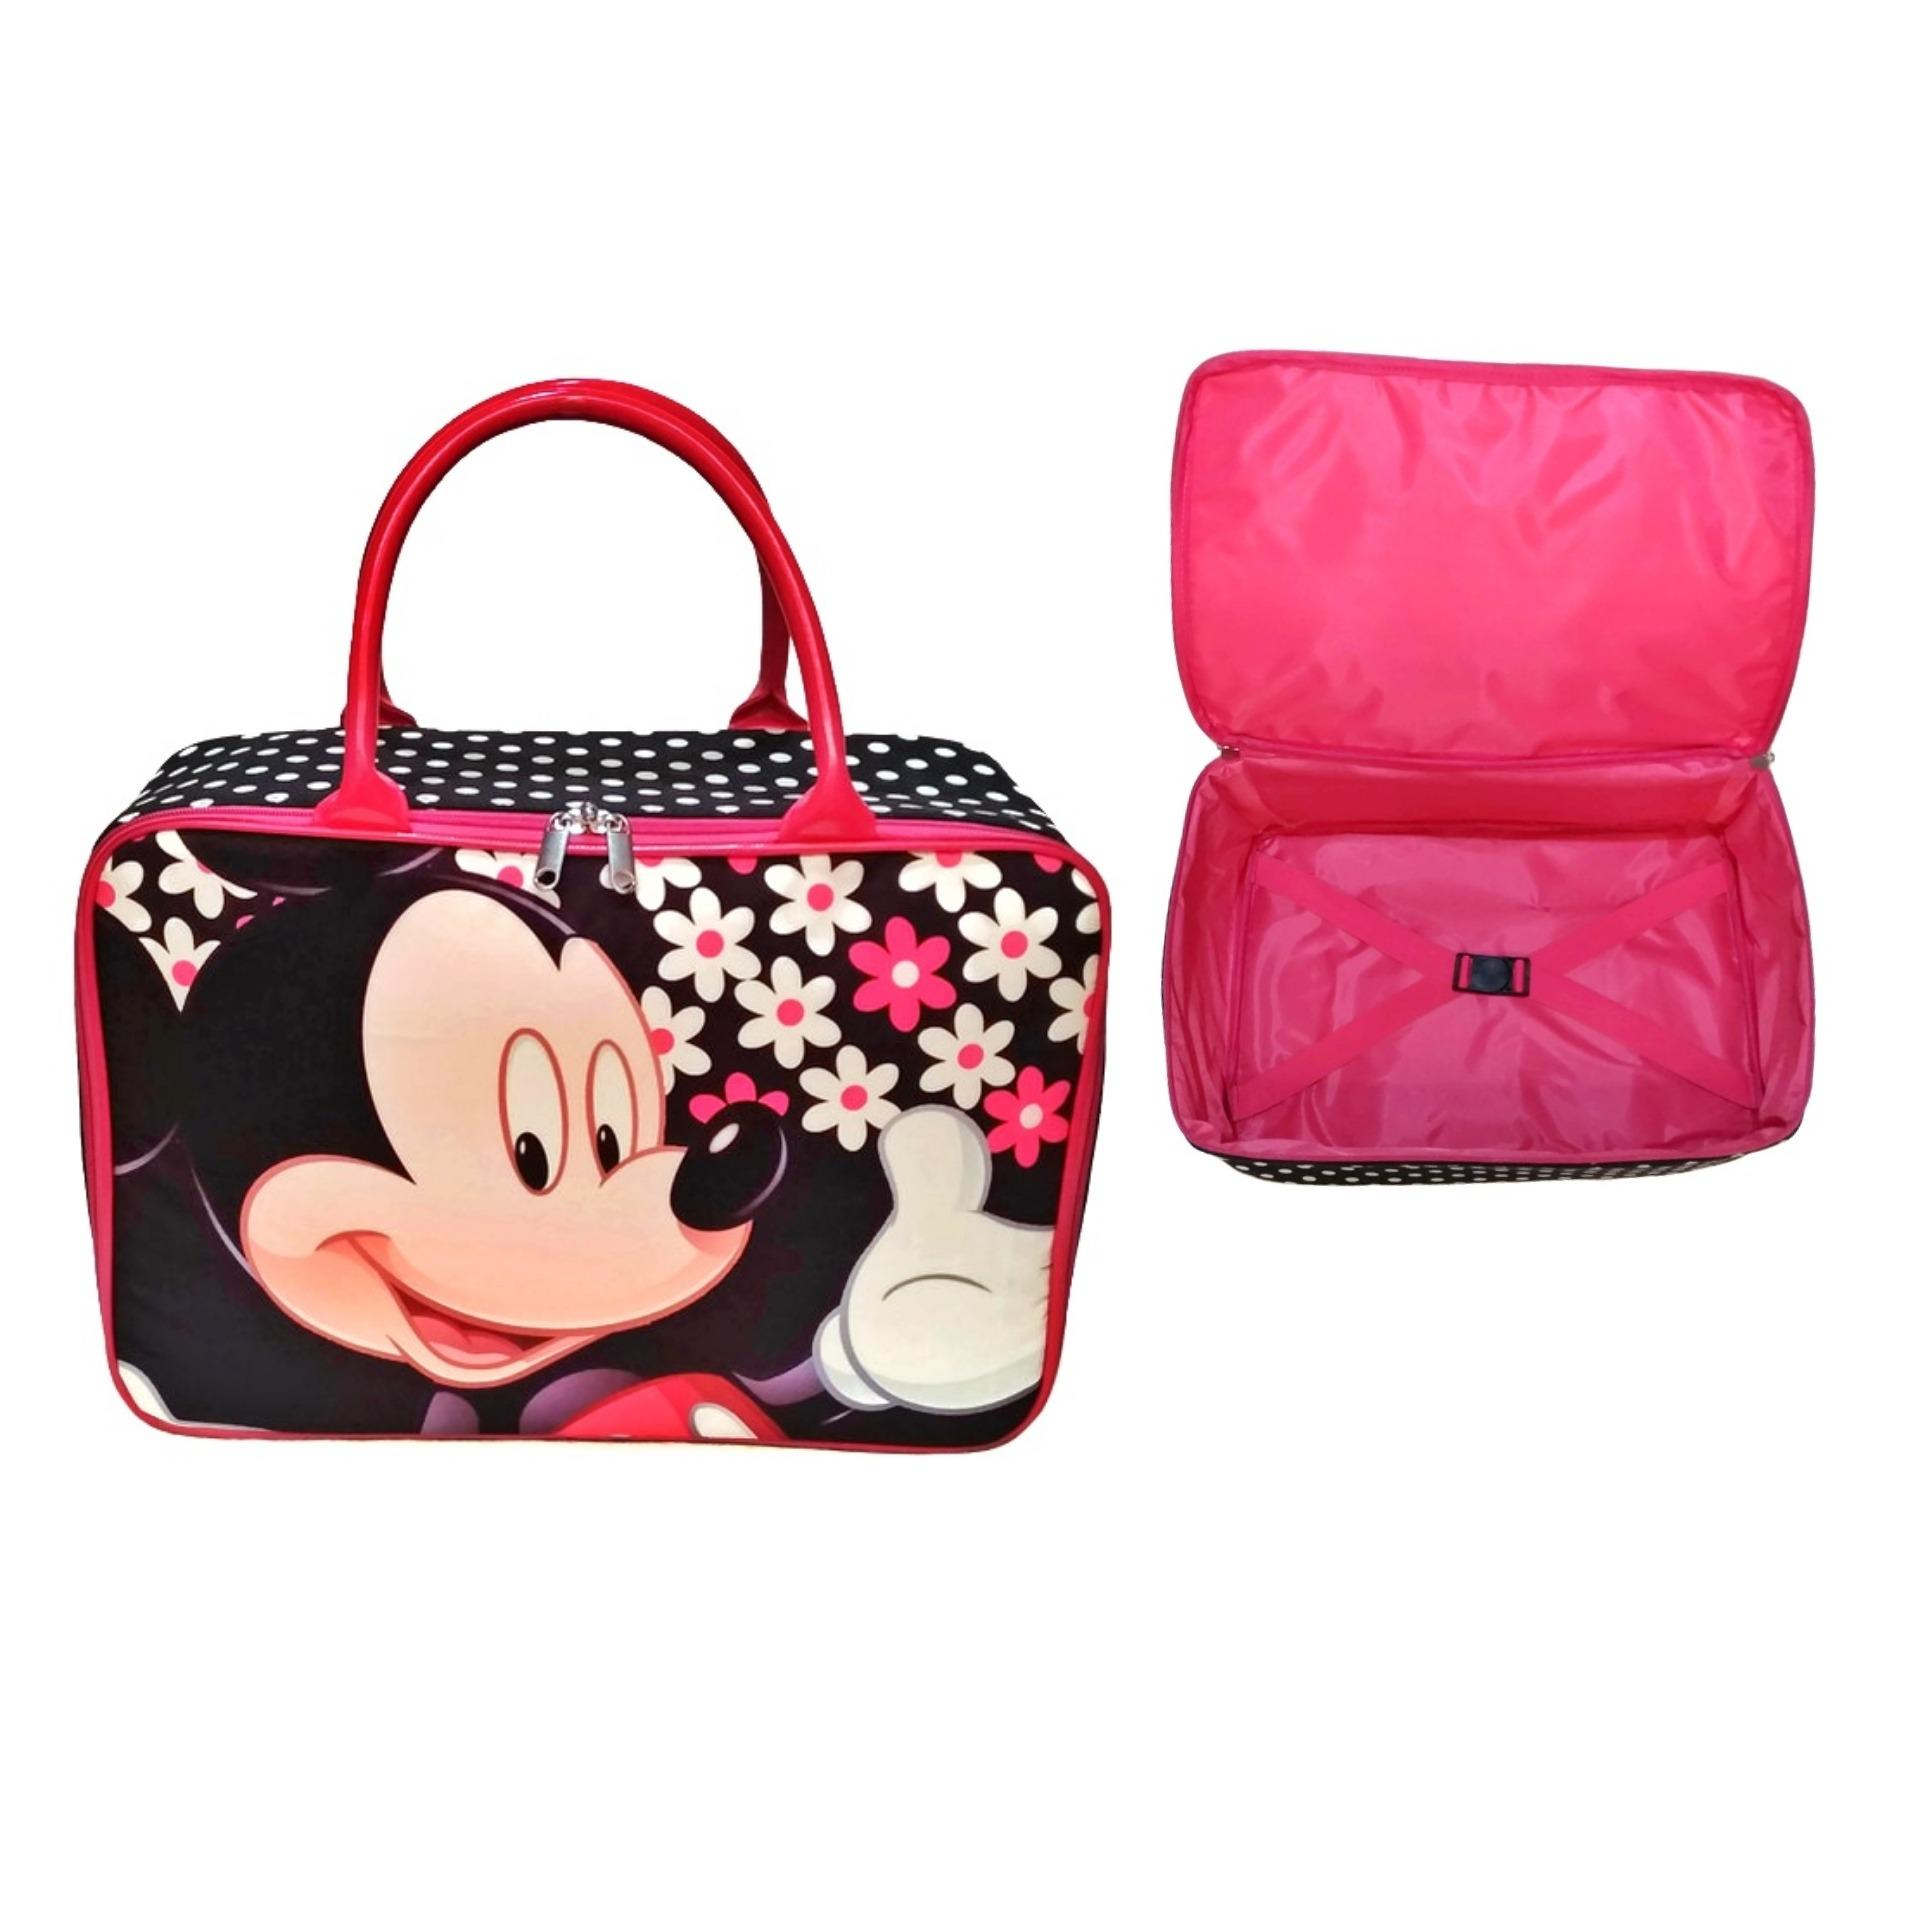 Amt Travel Bag Kanvas Mickey Mouse Jumbo Dengan Karet Pengikat Baju By Baby Kiddies Corner.